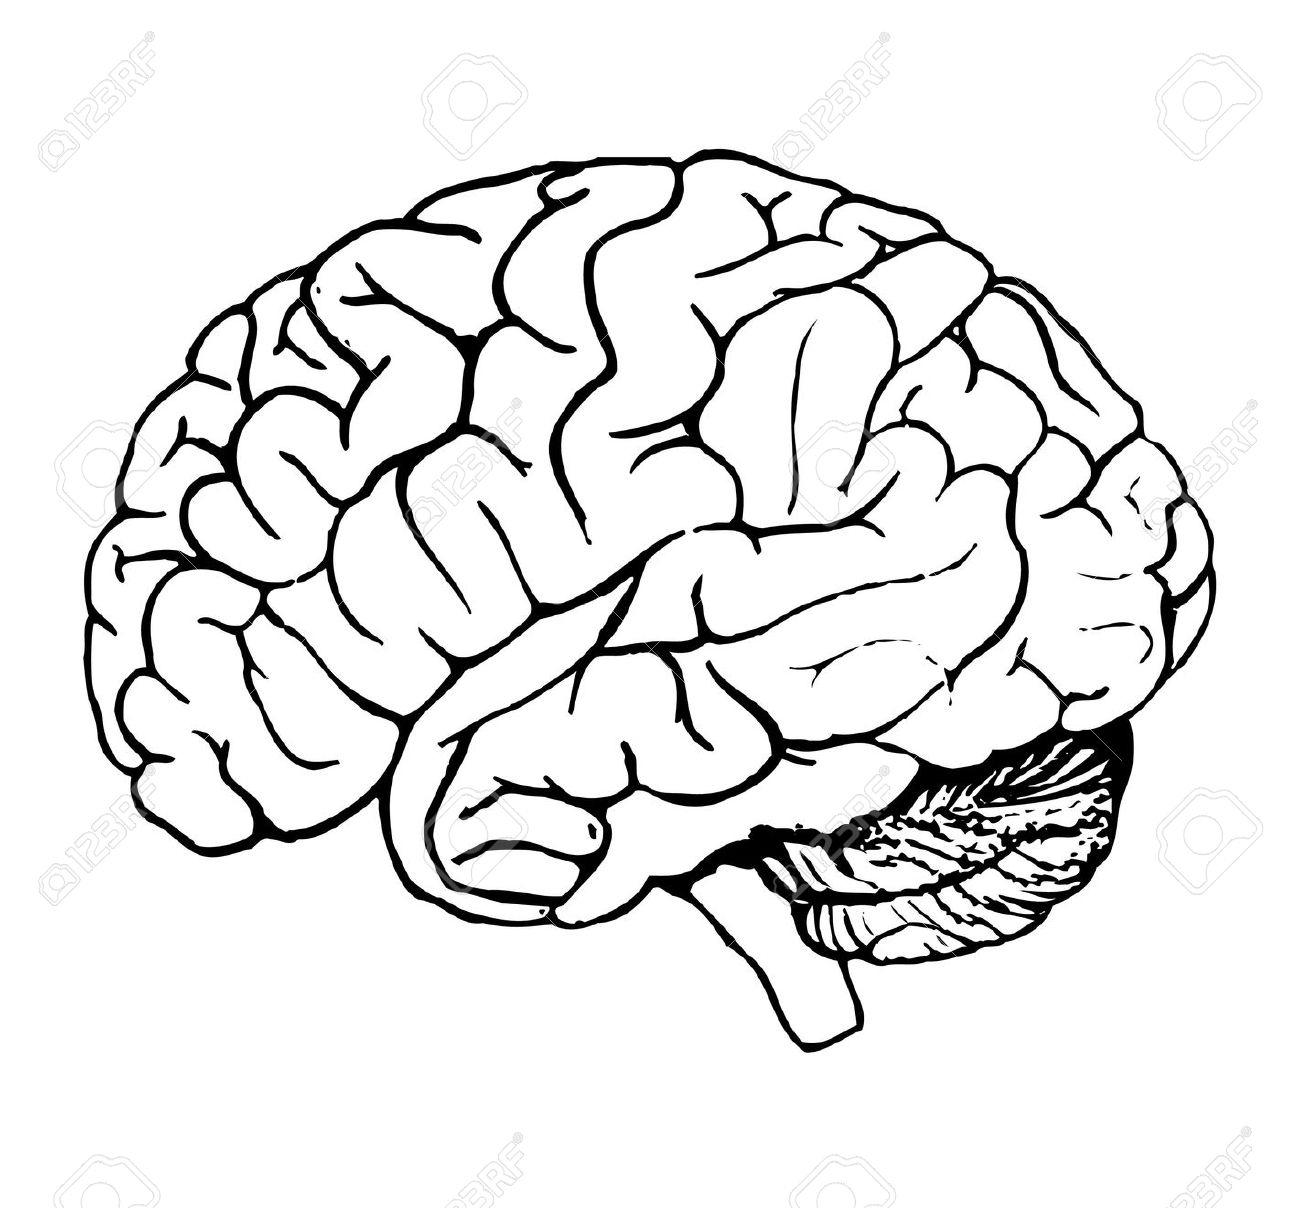 Mind clipart part the brain Brain Art Brain Art Human